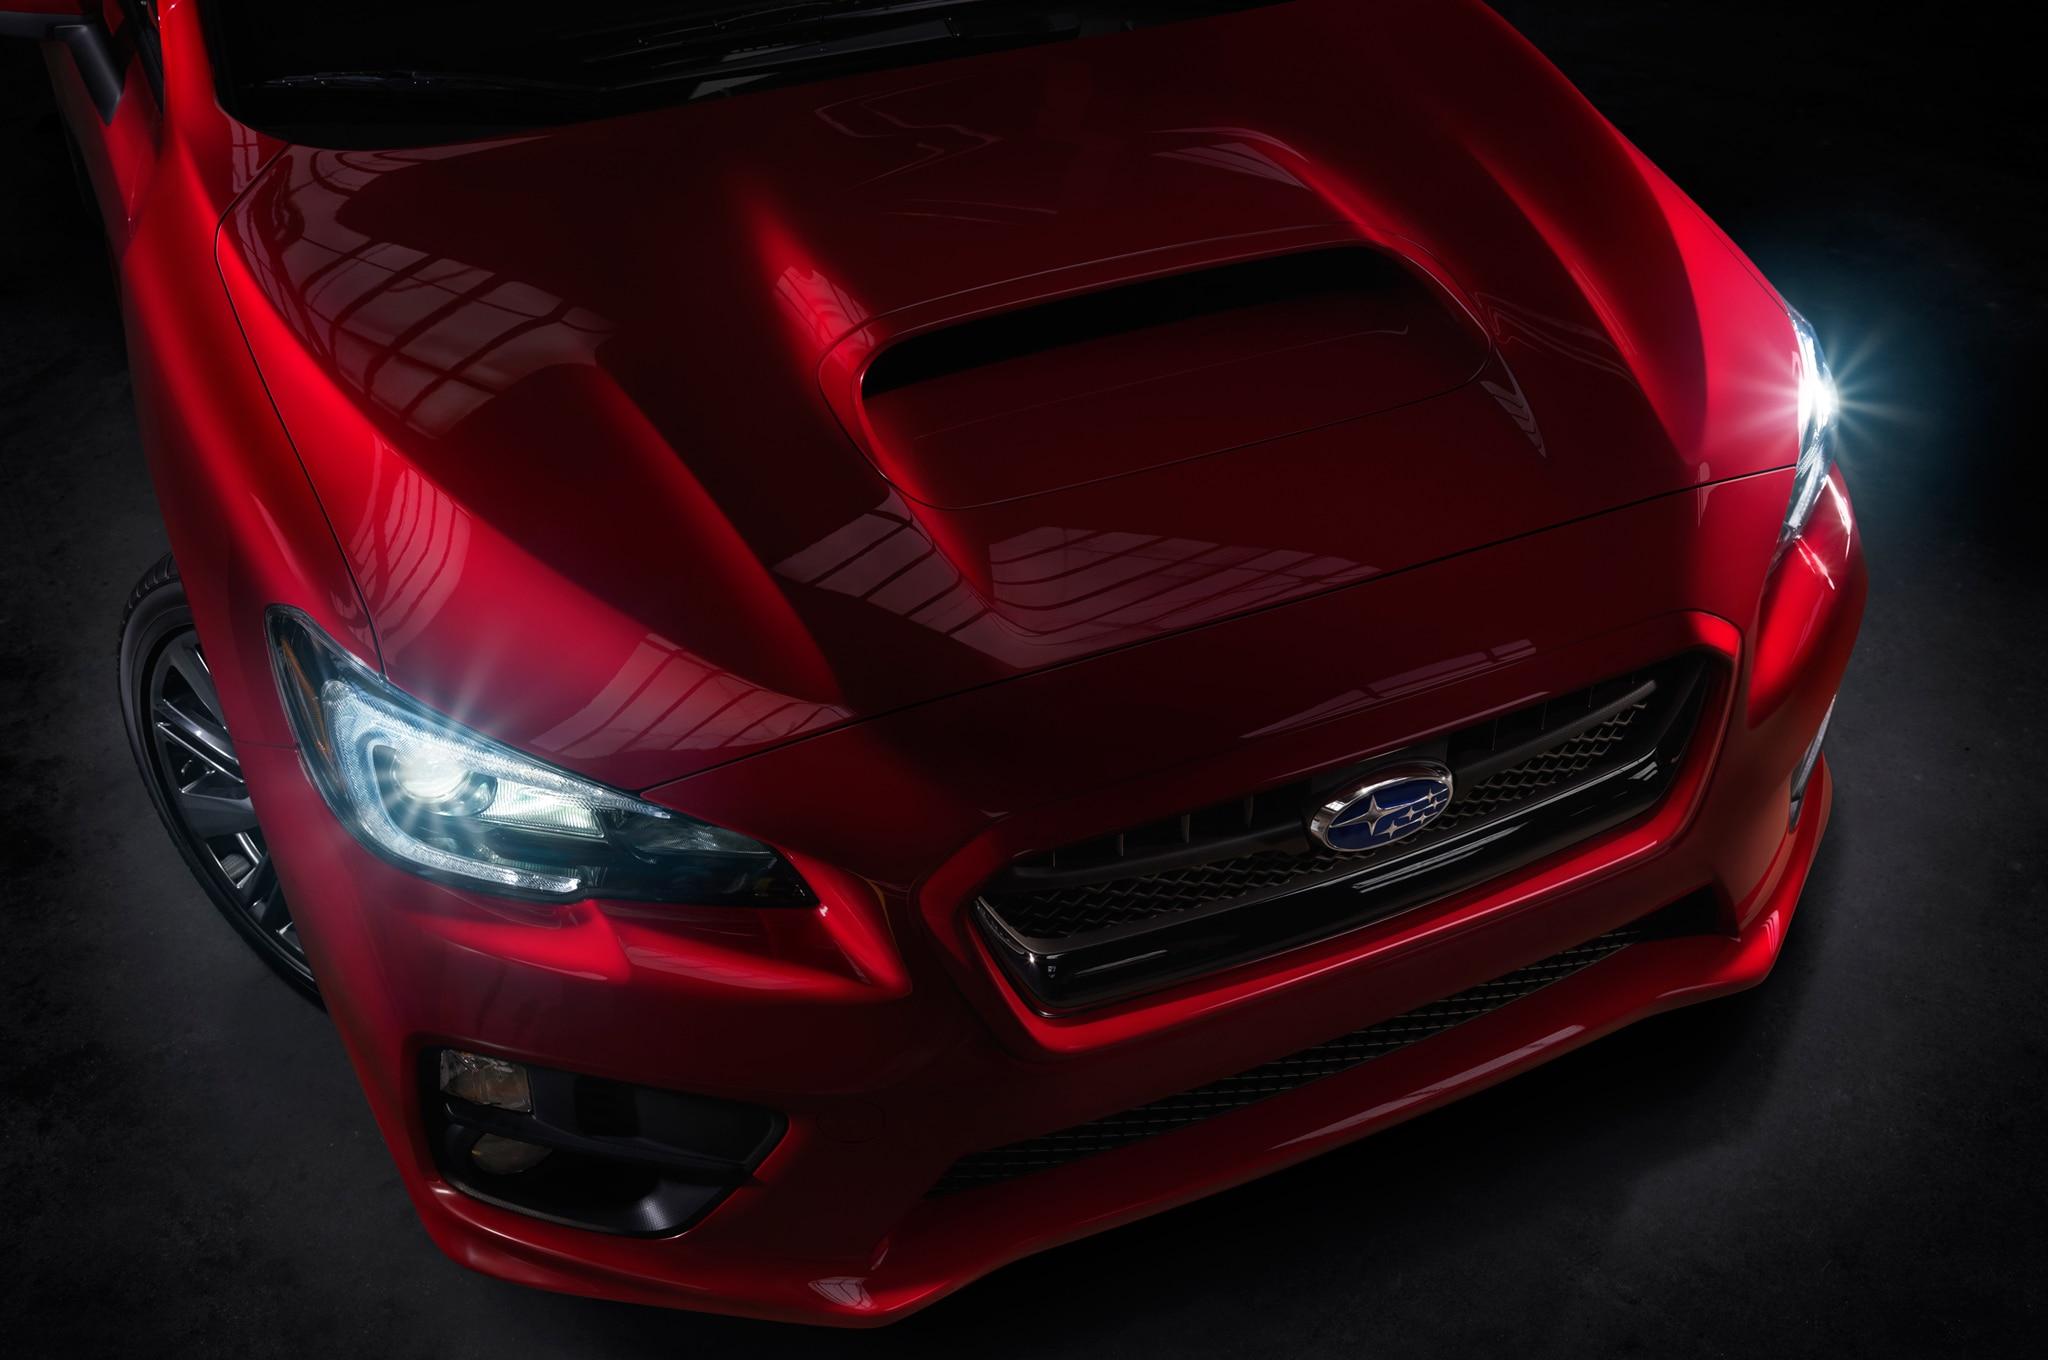 2015 Subaru Wrx Front Close1